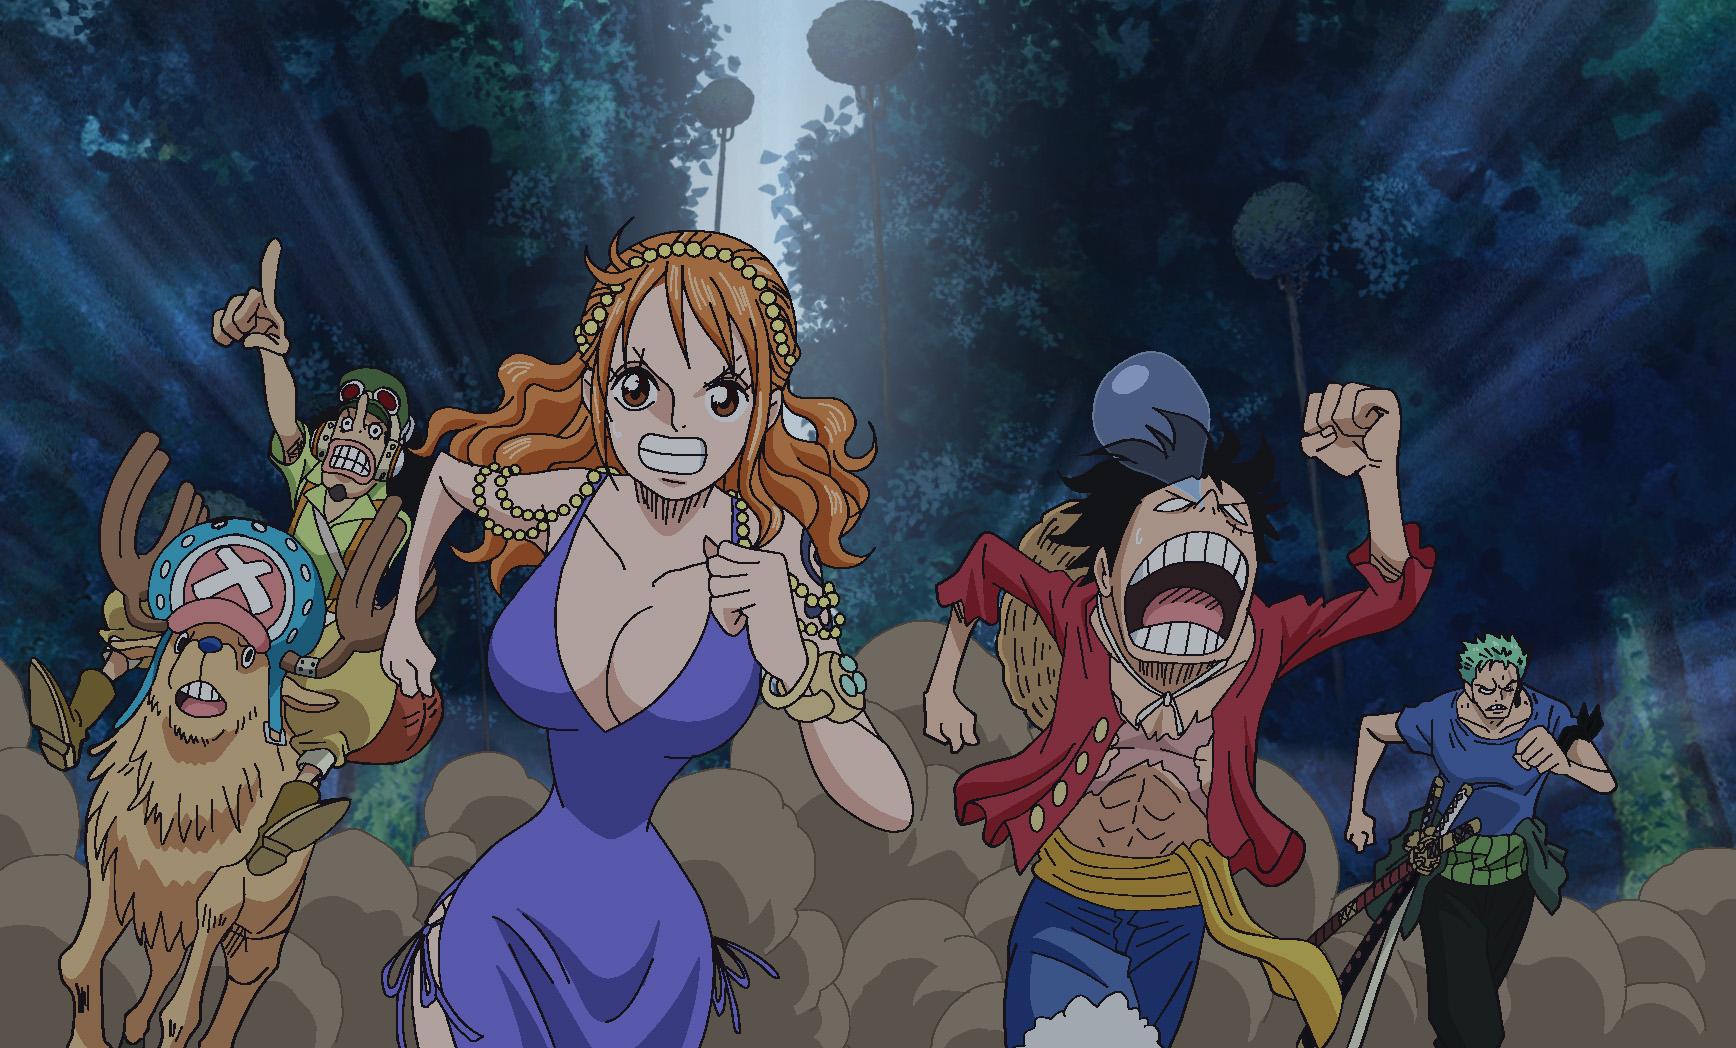 Watch One Piece Season 13 Episode 767 Anime on Funimation